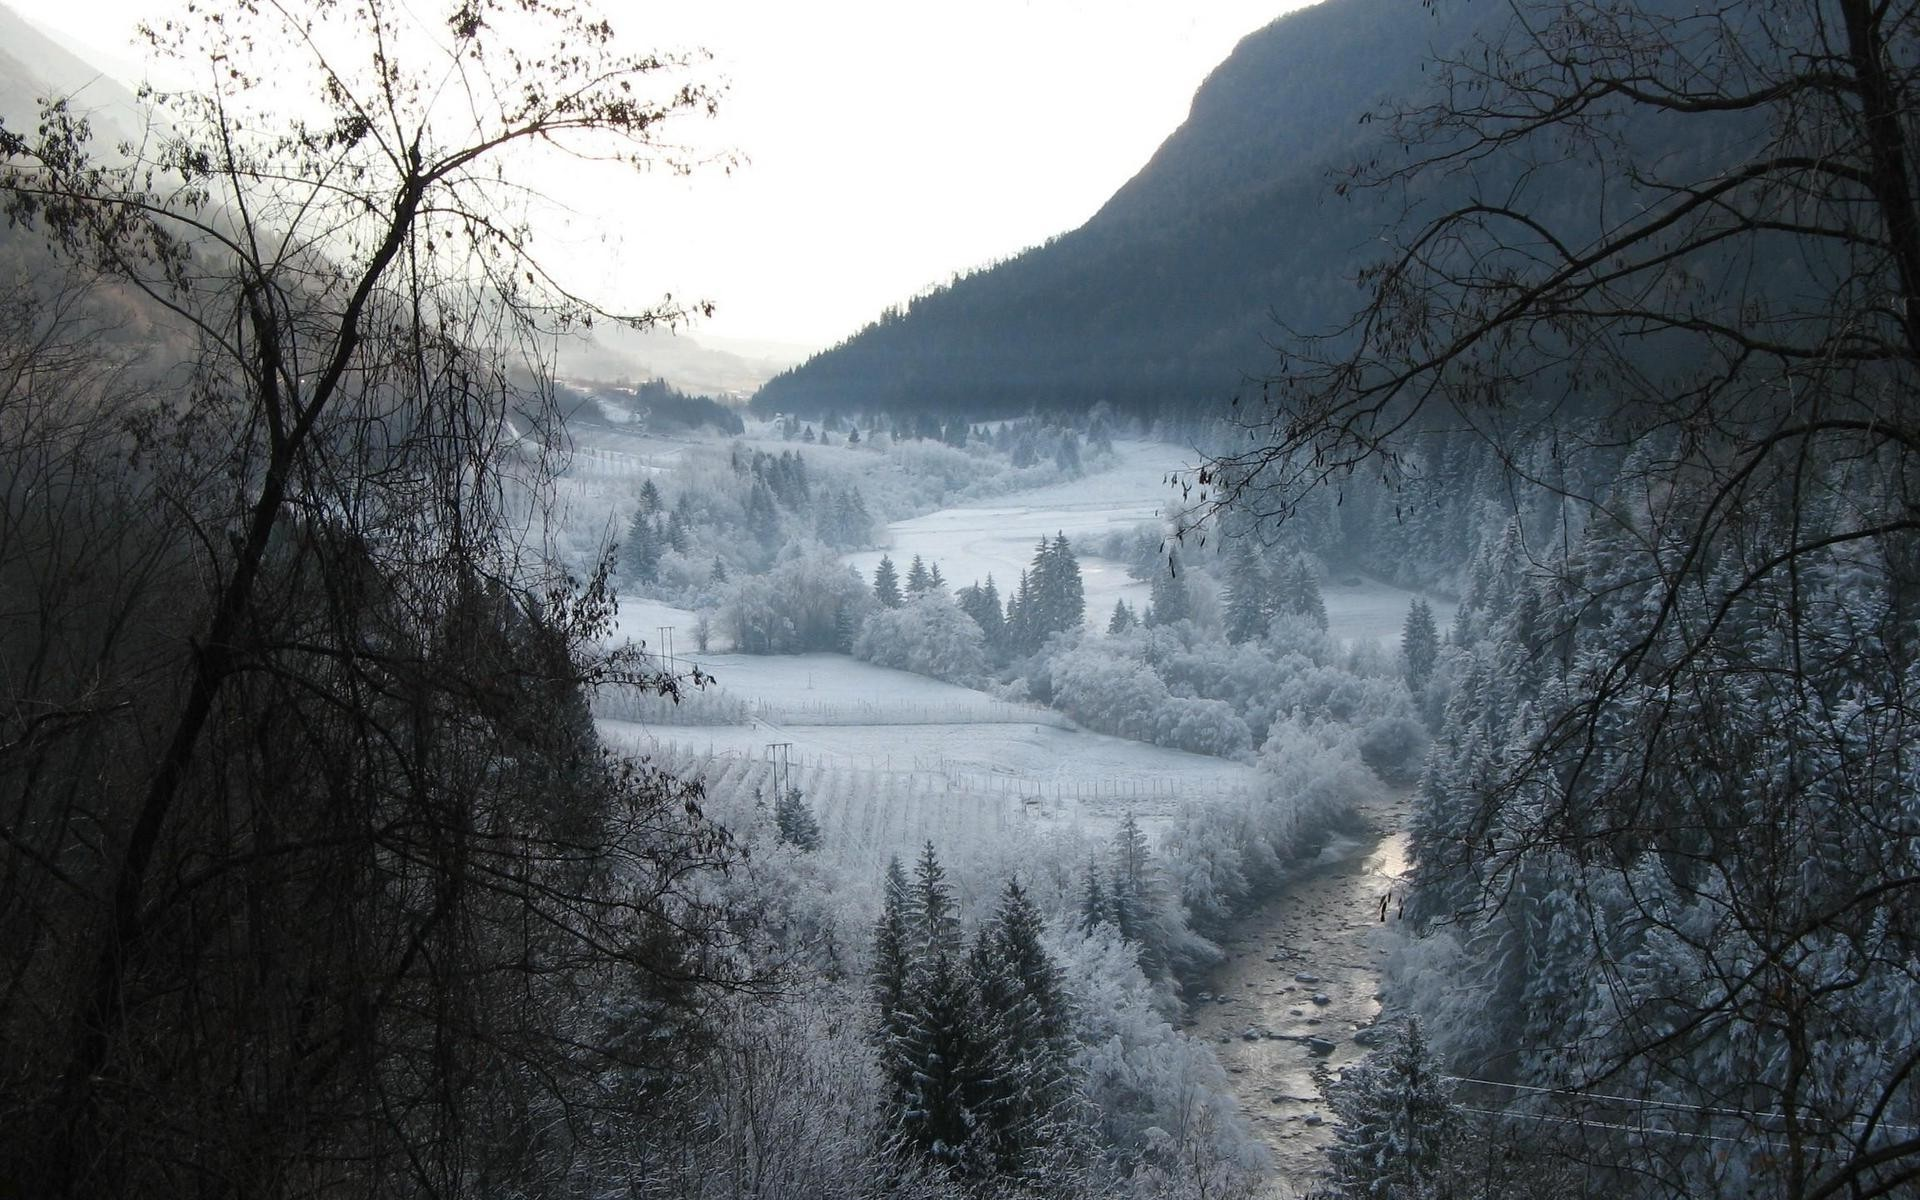 Winter Forest Snowy Forest Wallpapers Wallcoo.net Desktop Background